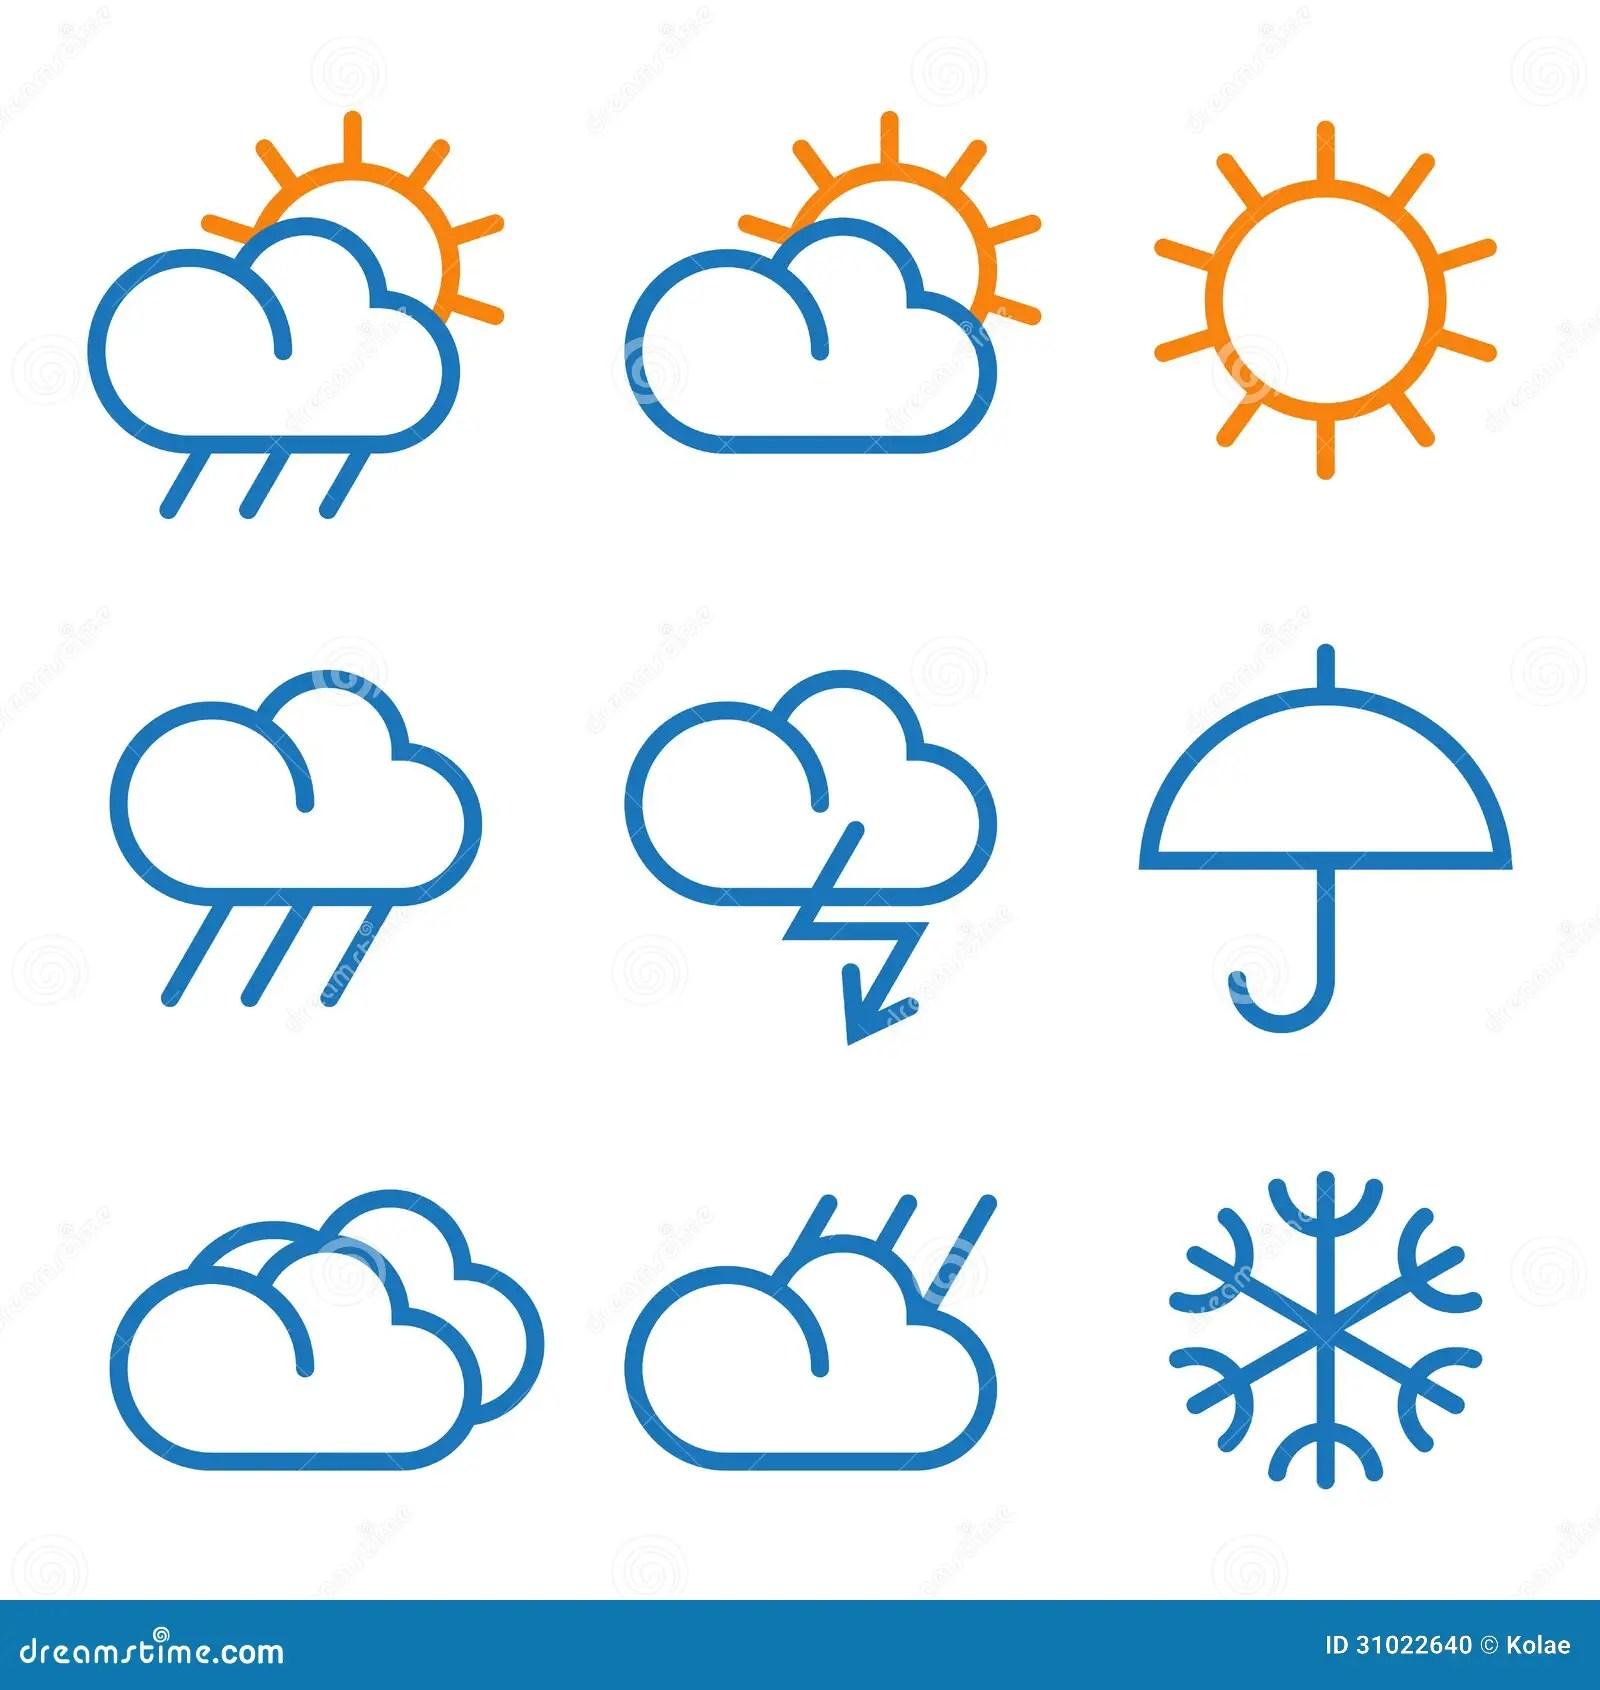 Worksheet Based On Weather